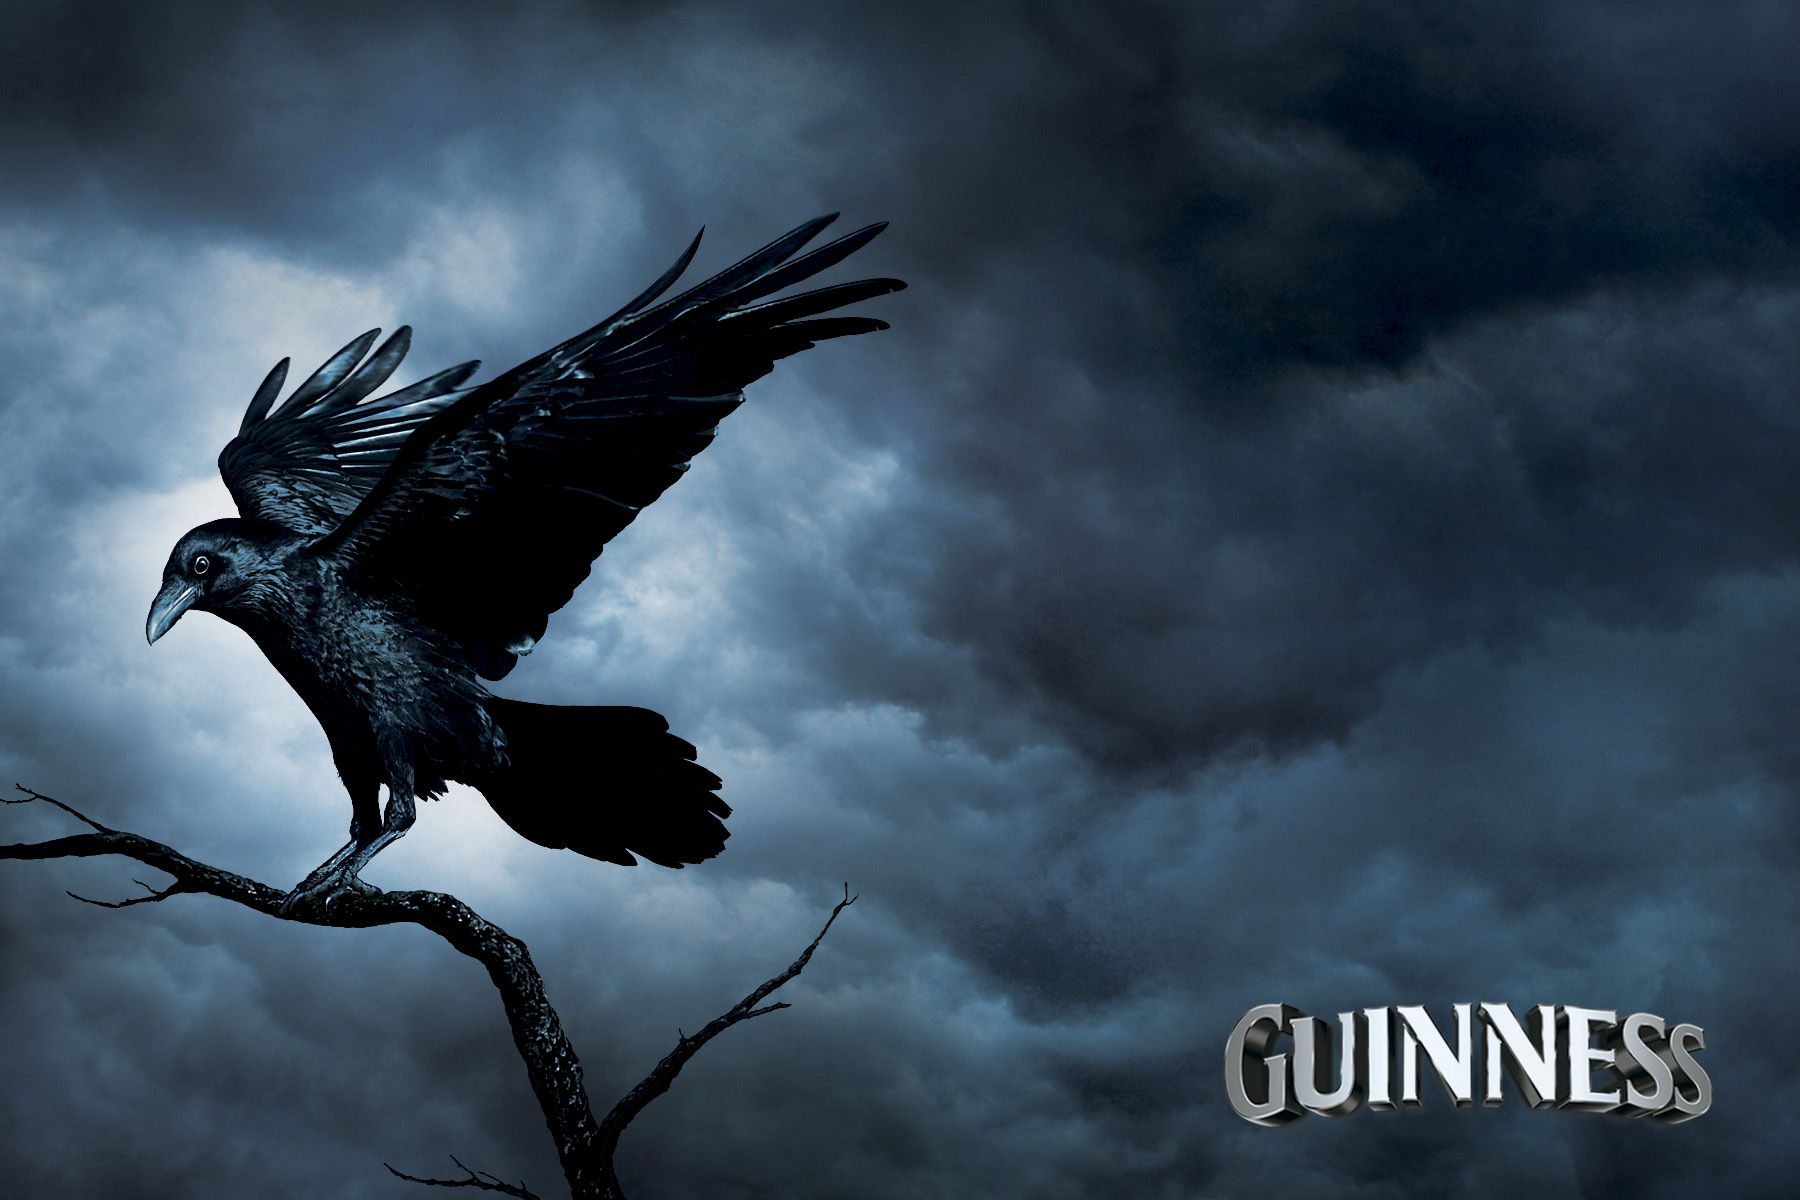 stephen cribbin . subtle composites Guinness The Raven